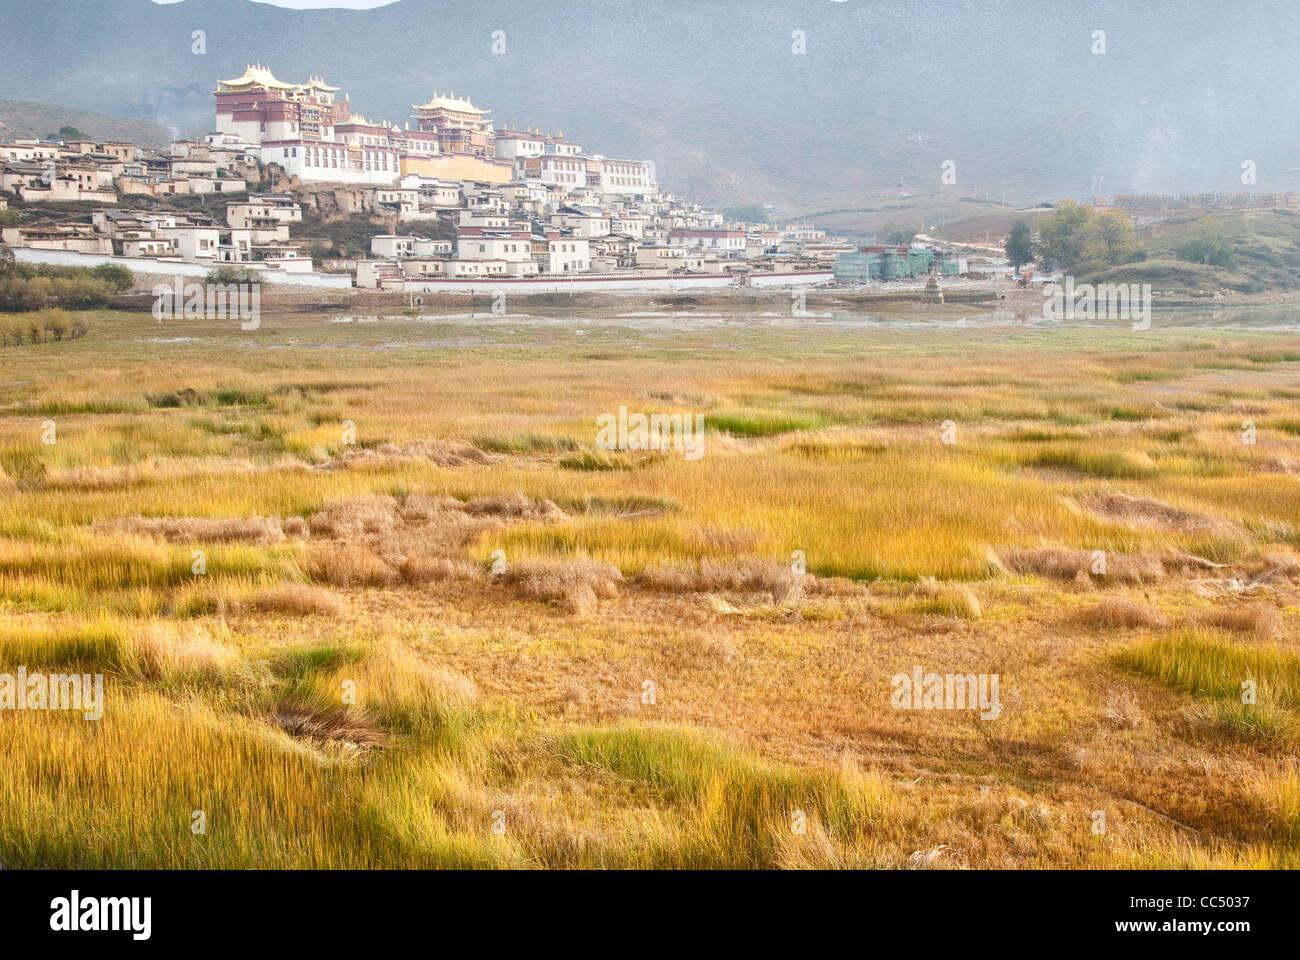 Lamasery Songzanlin, Shangri-la, DiQing tibetano prefettura autonoma, Yunnan , Cina Immagini Stock